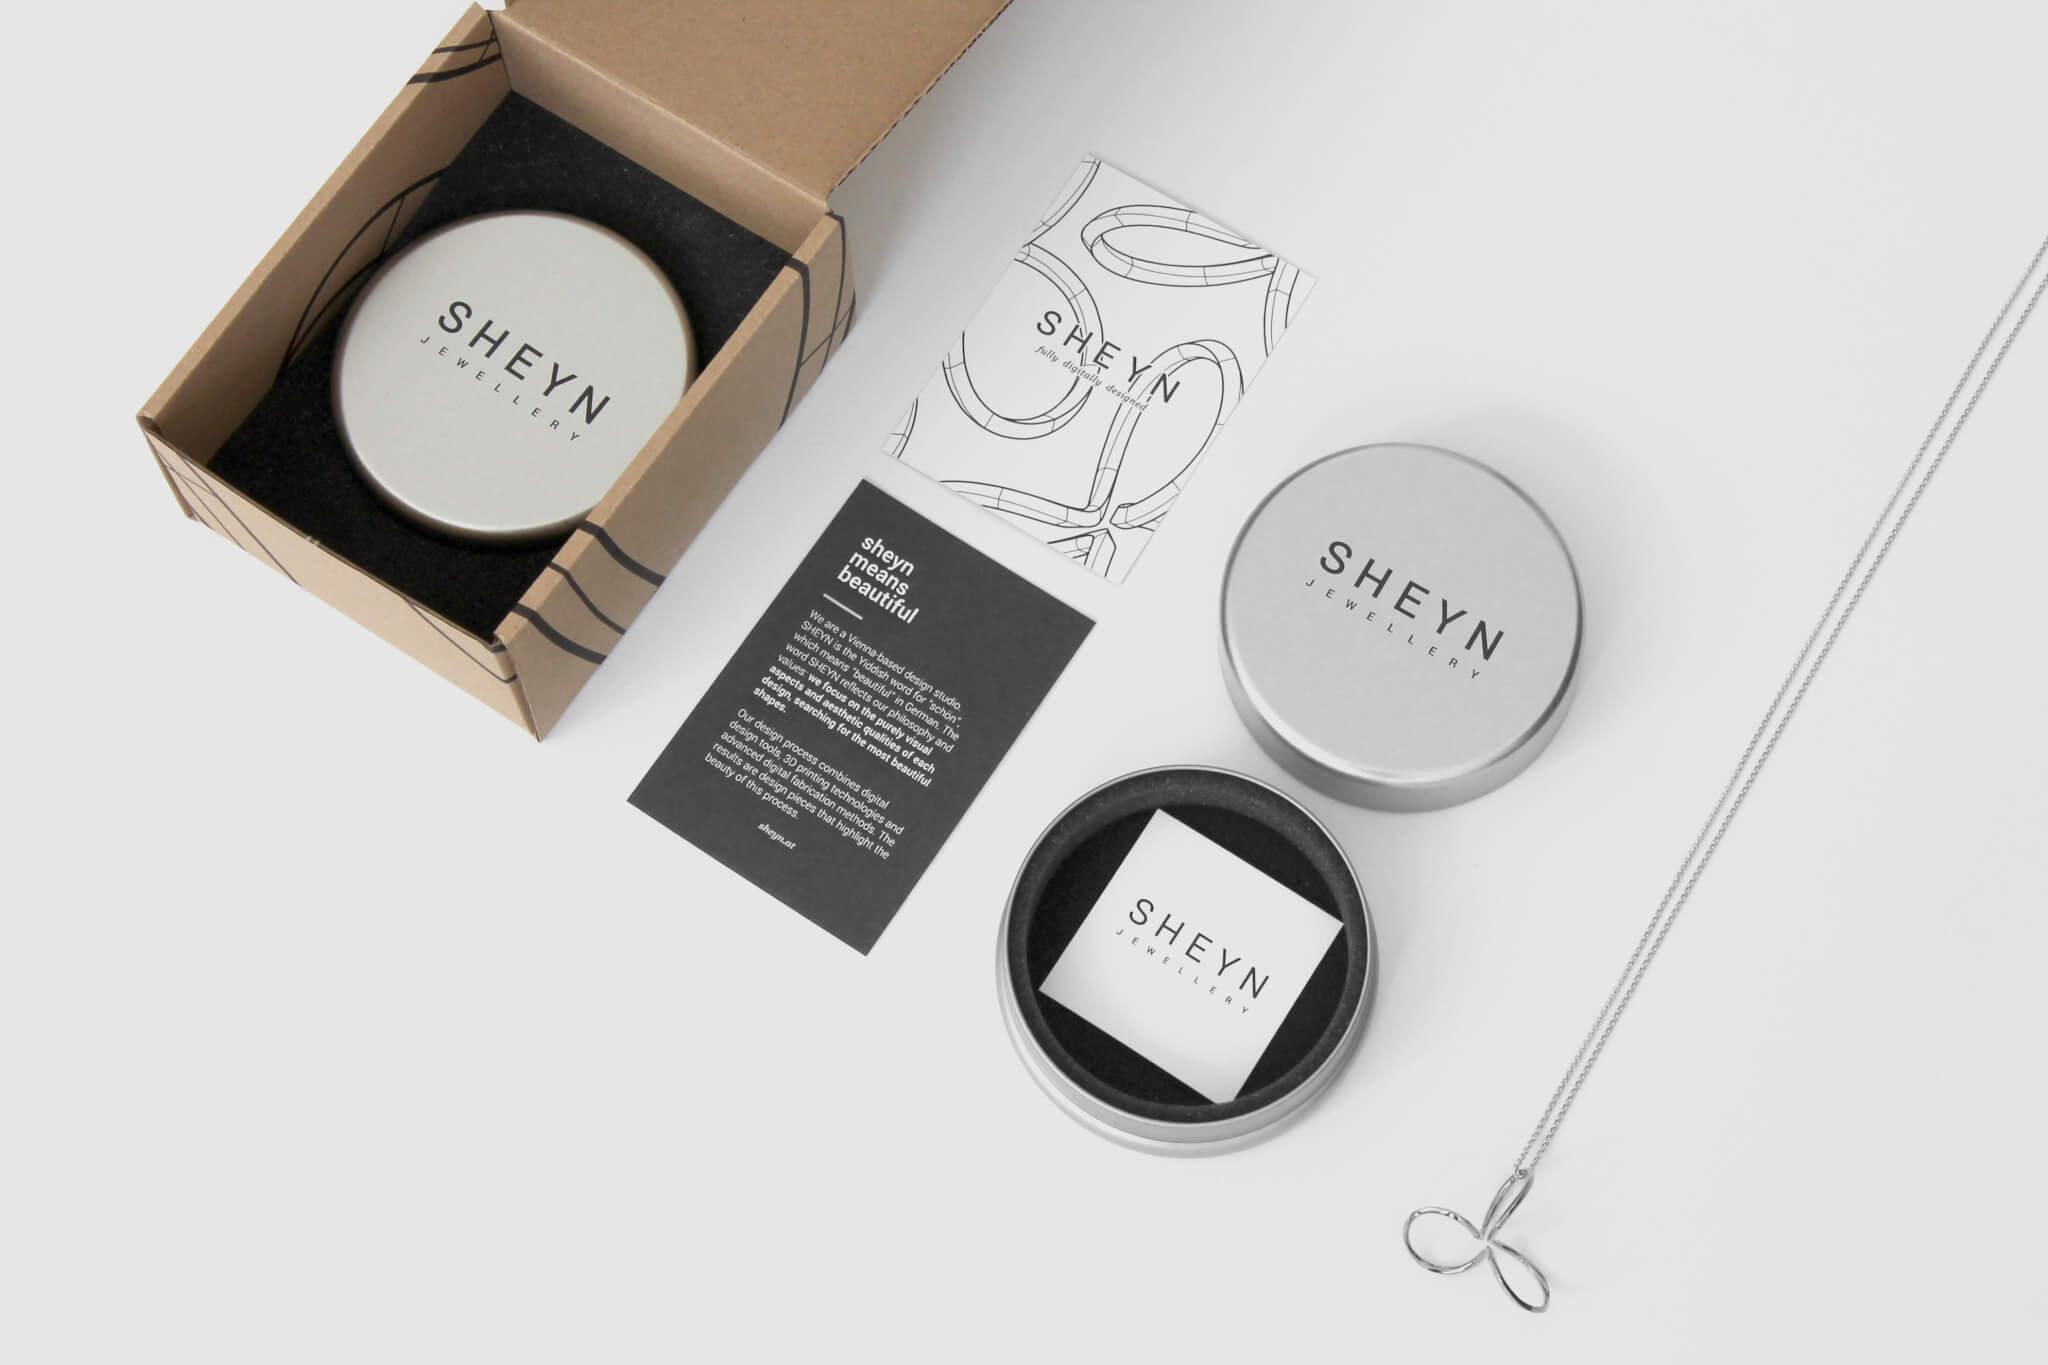 emballage SHEYN